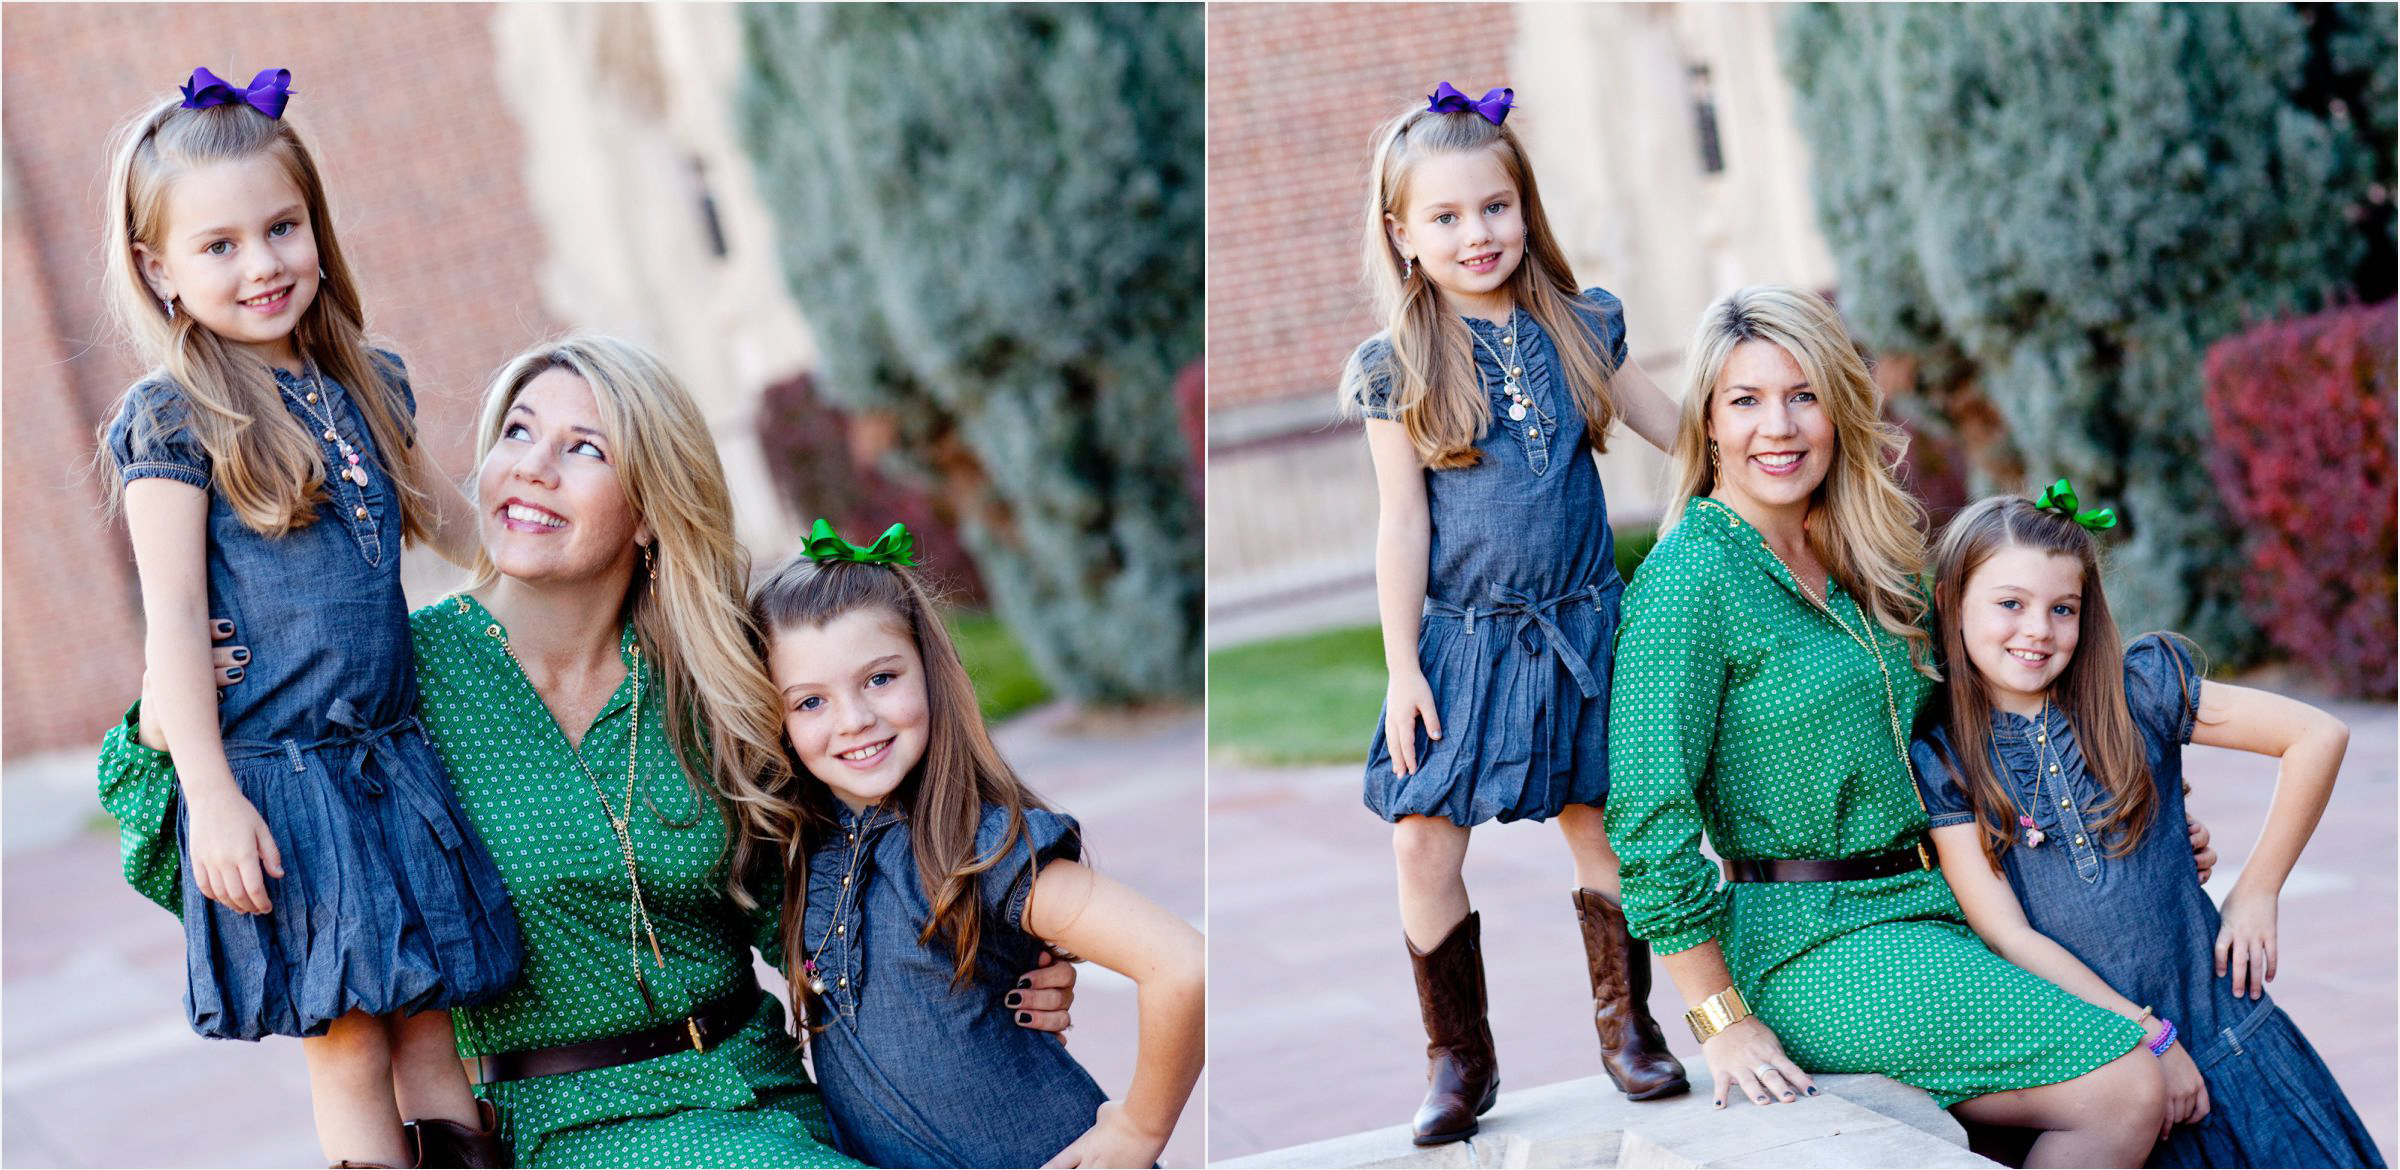 mother-daughter-collegiate-type-photo-shoot-at-Denver-University-003